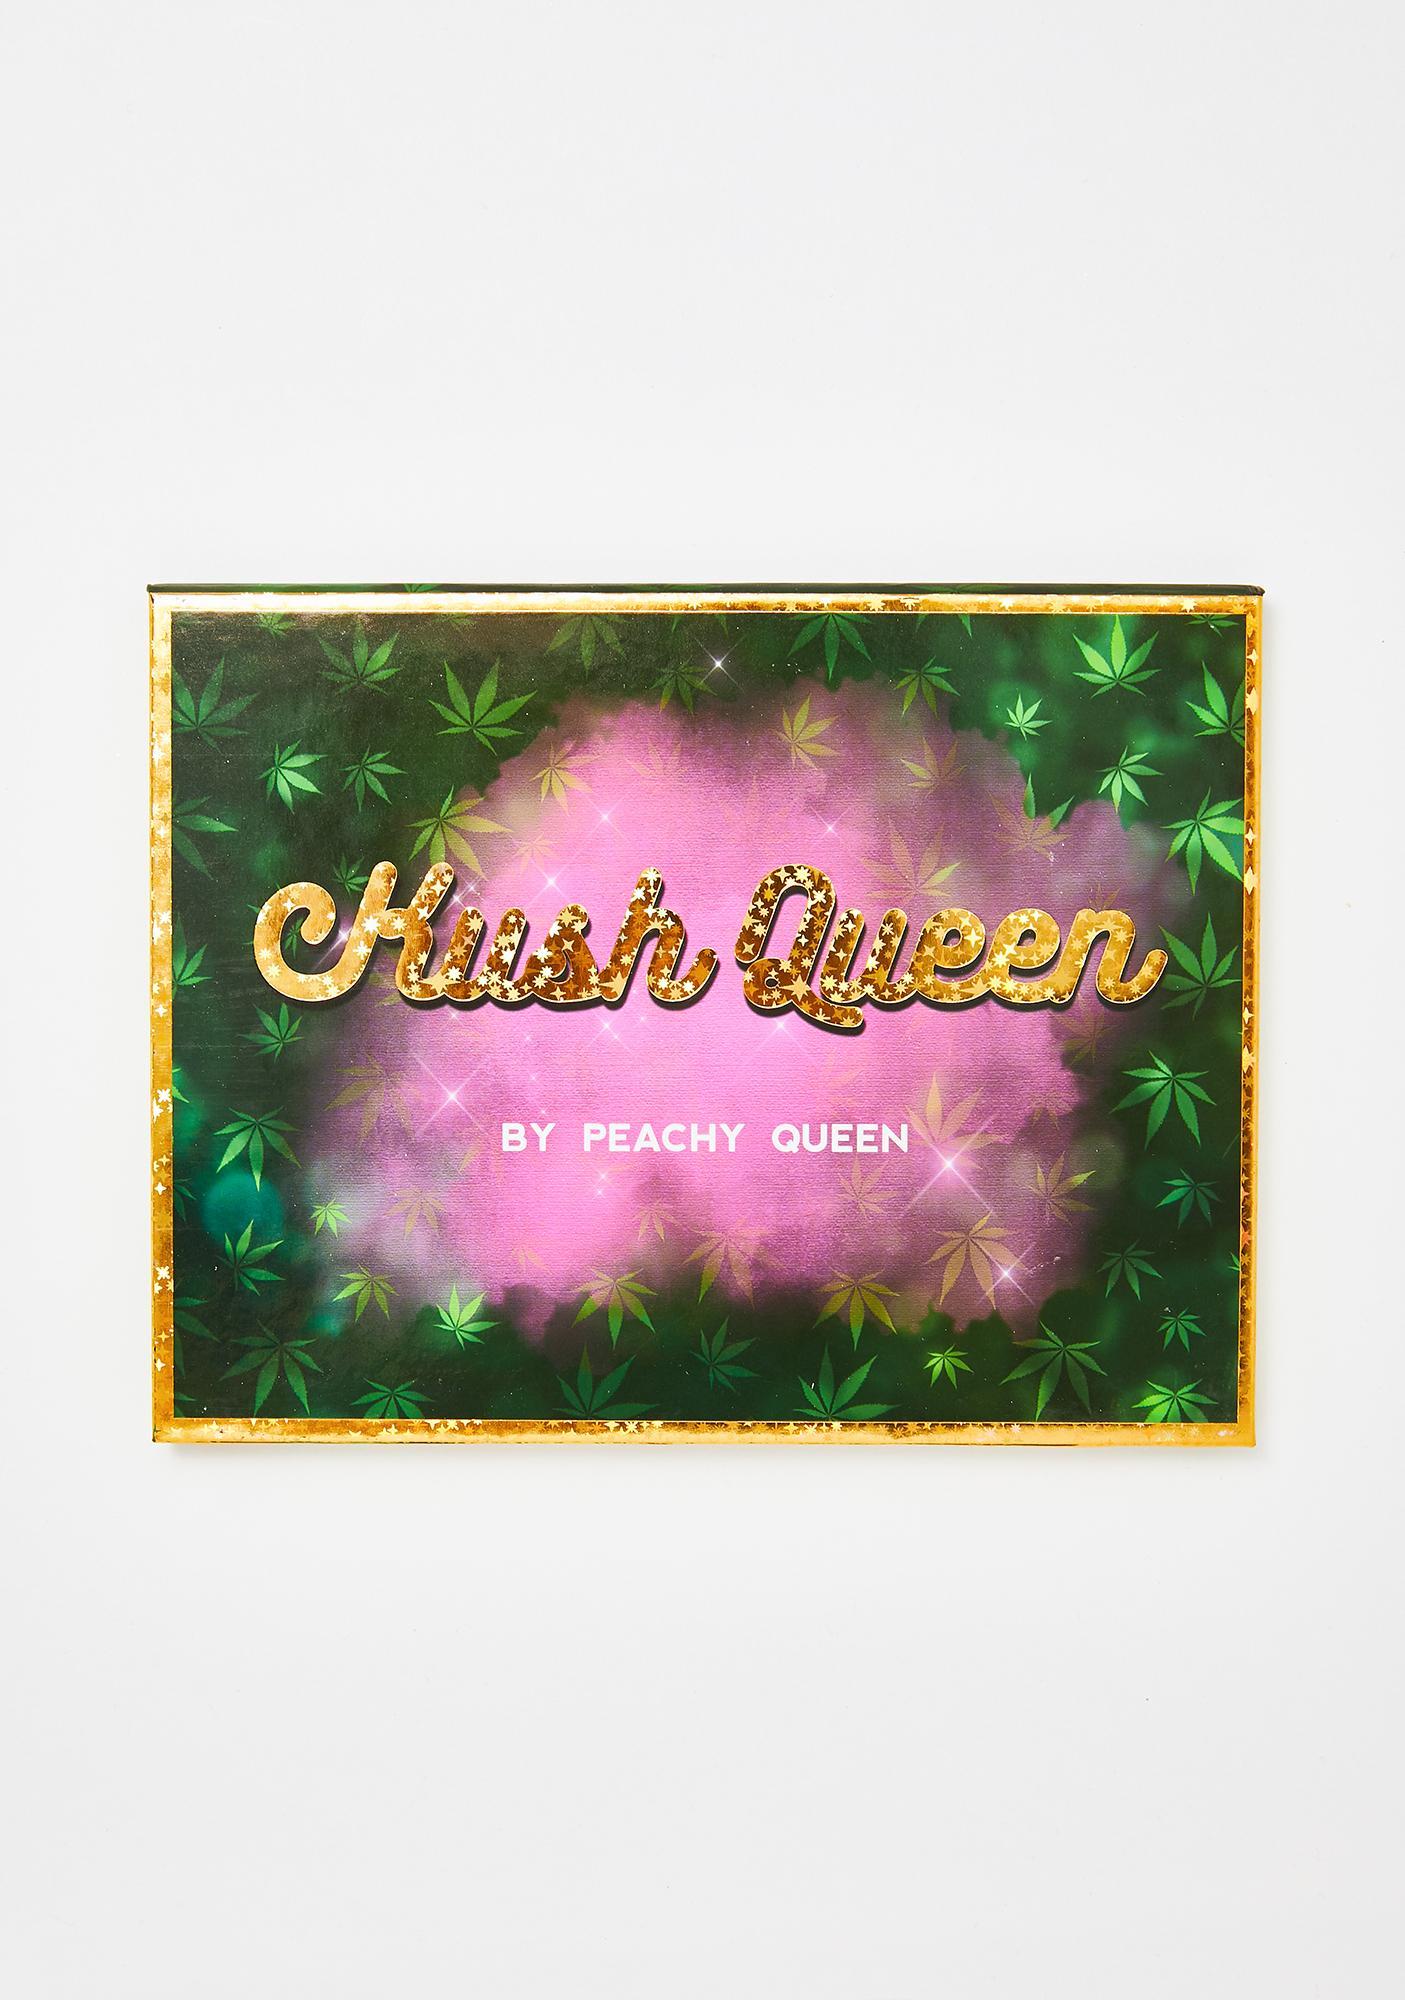 Peachy Queen Kush Queen Palette